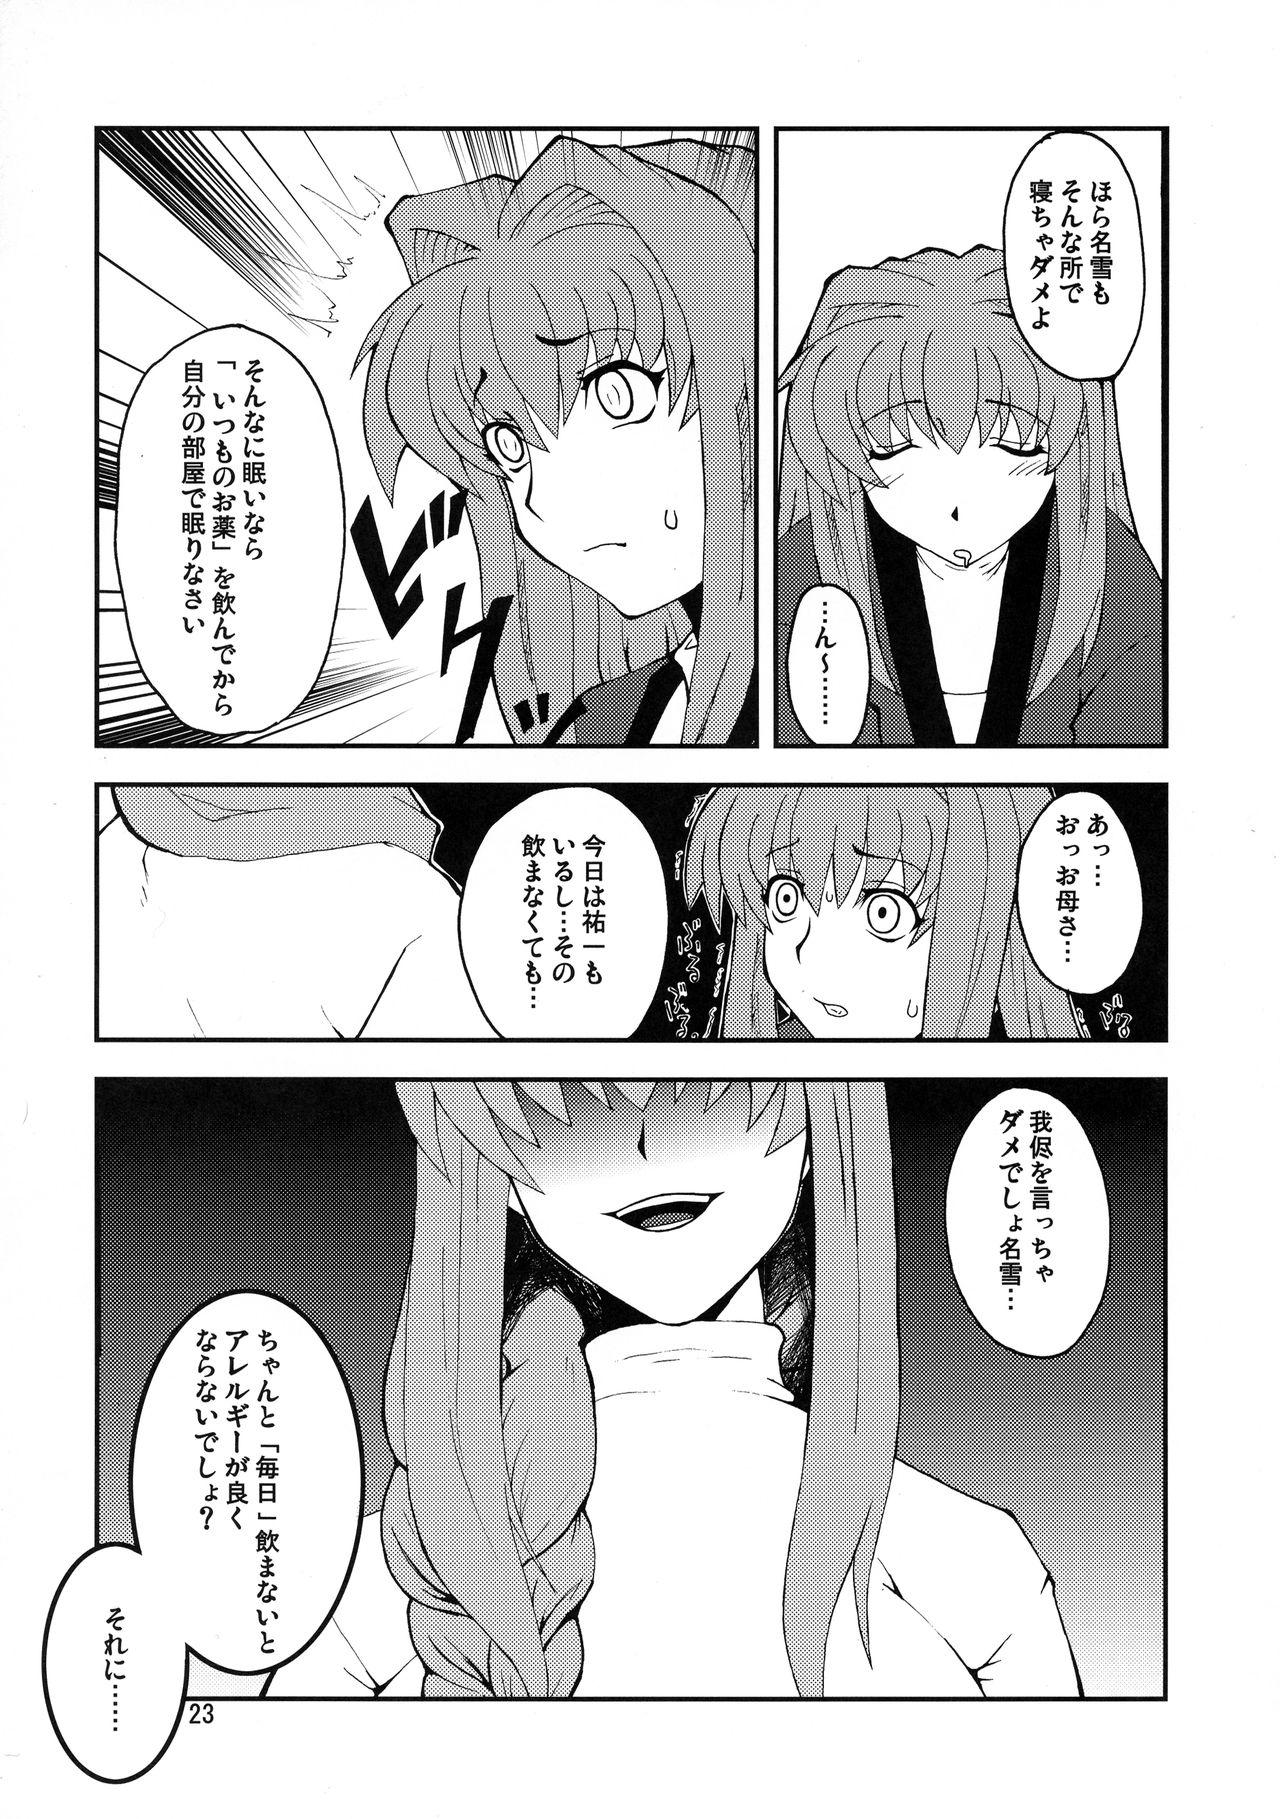 Kyouki Vol. 3~5 Remake Ver. 22